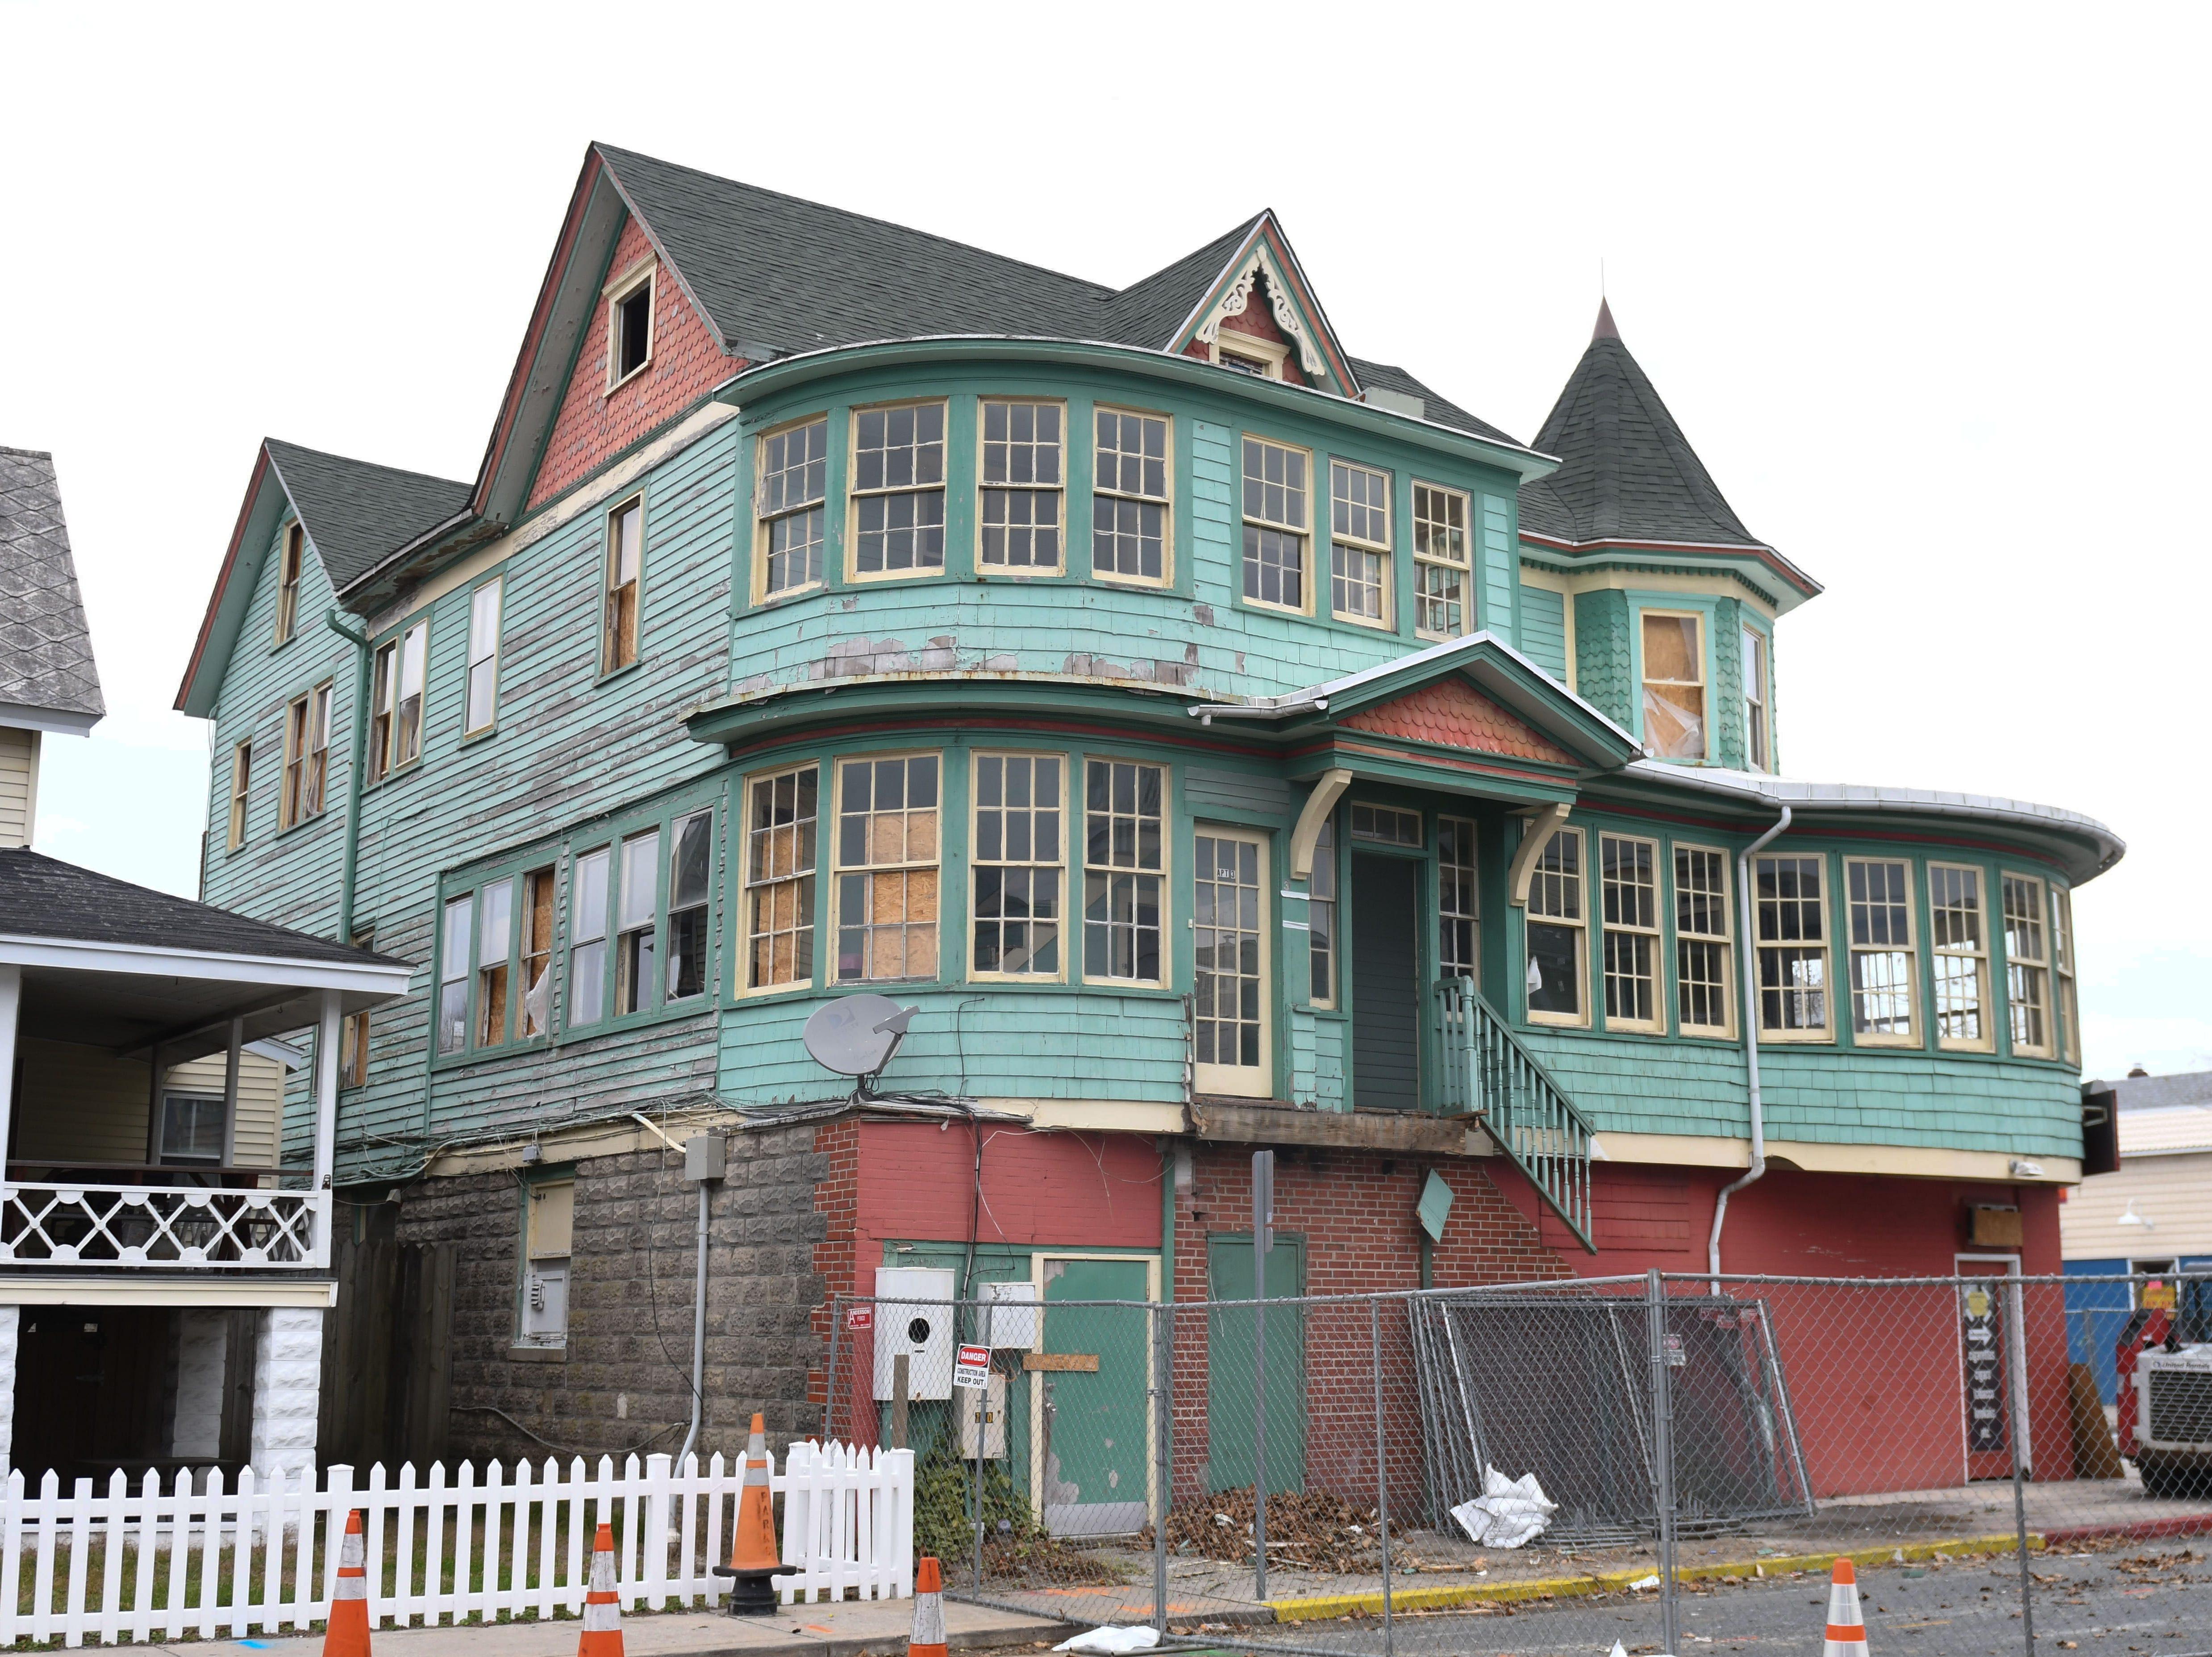 PHOTOS: Historic Ocean City building demolished